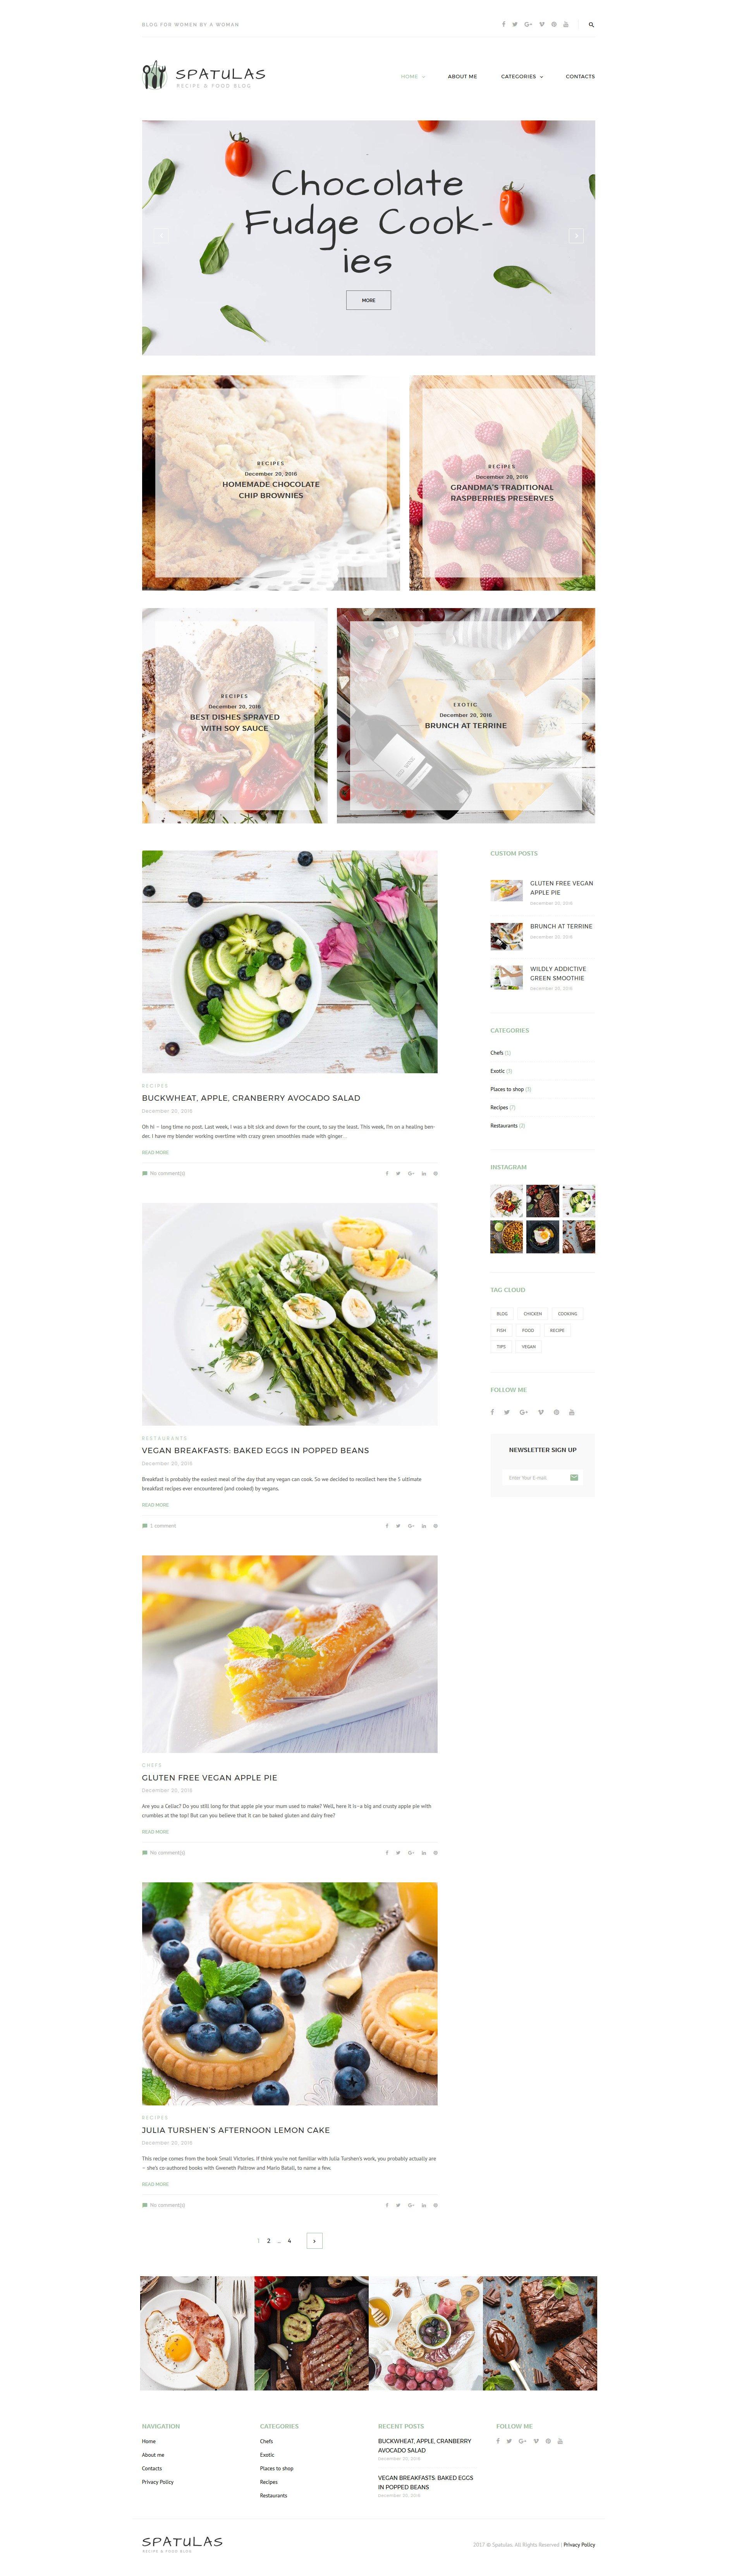 """Spatulas - Recipe & Food Blog"" 响应式WordPress模板 #63601"